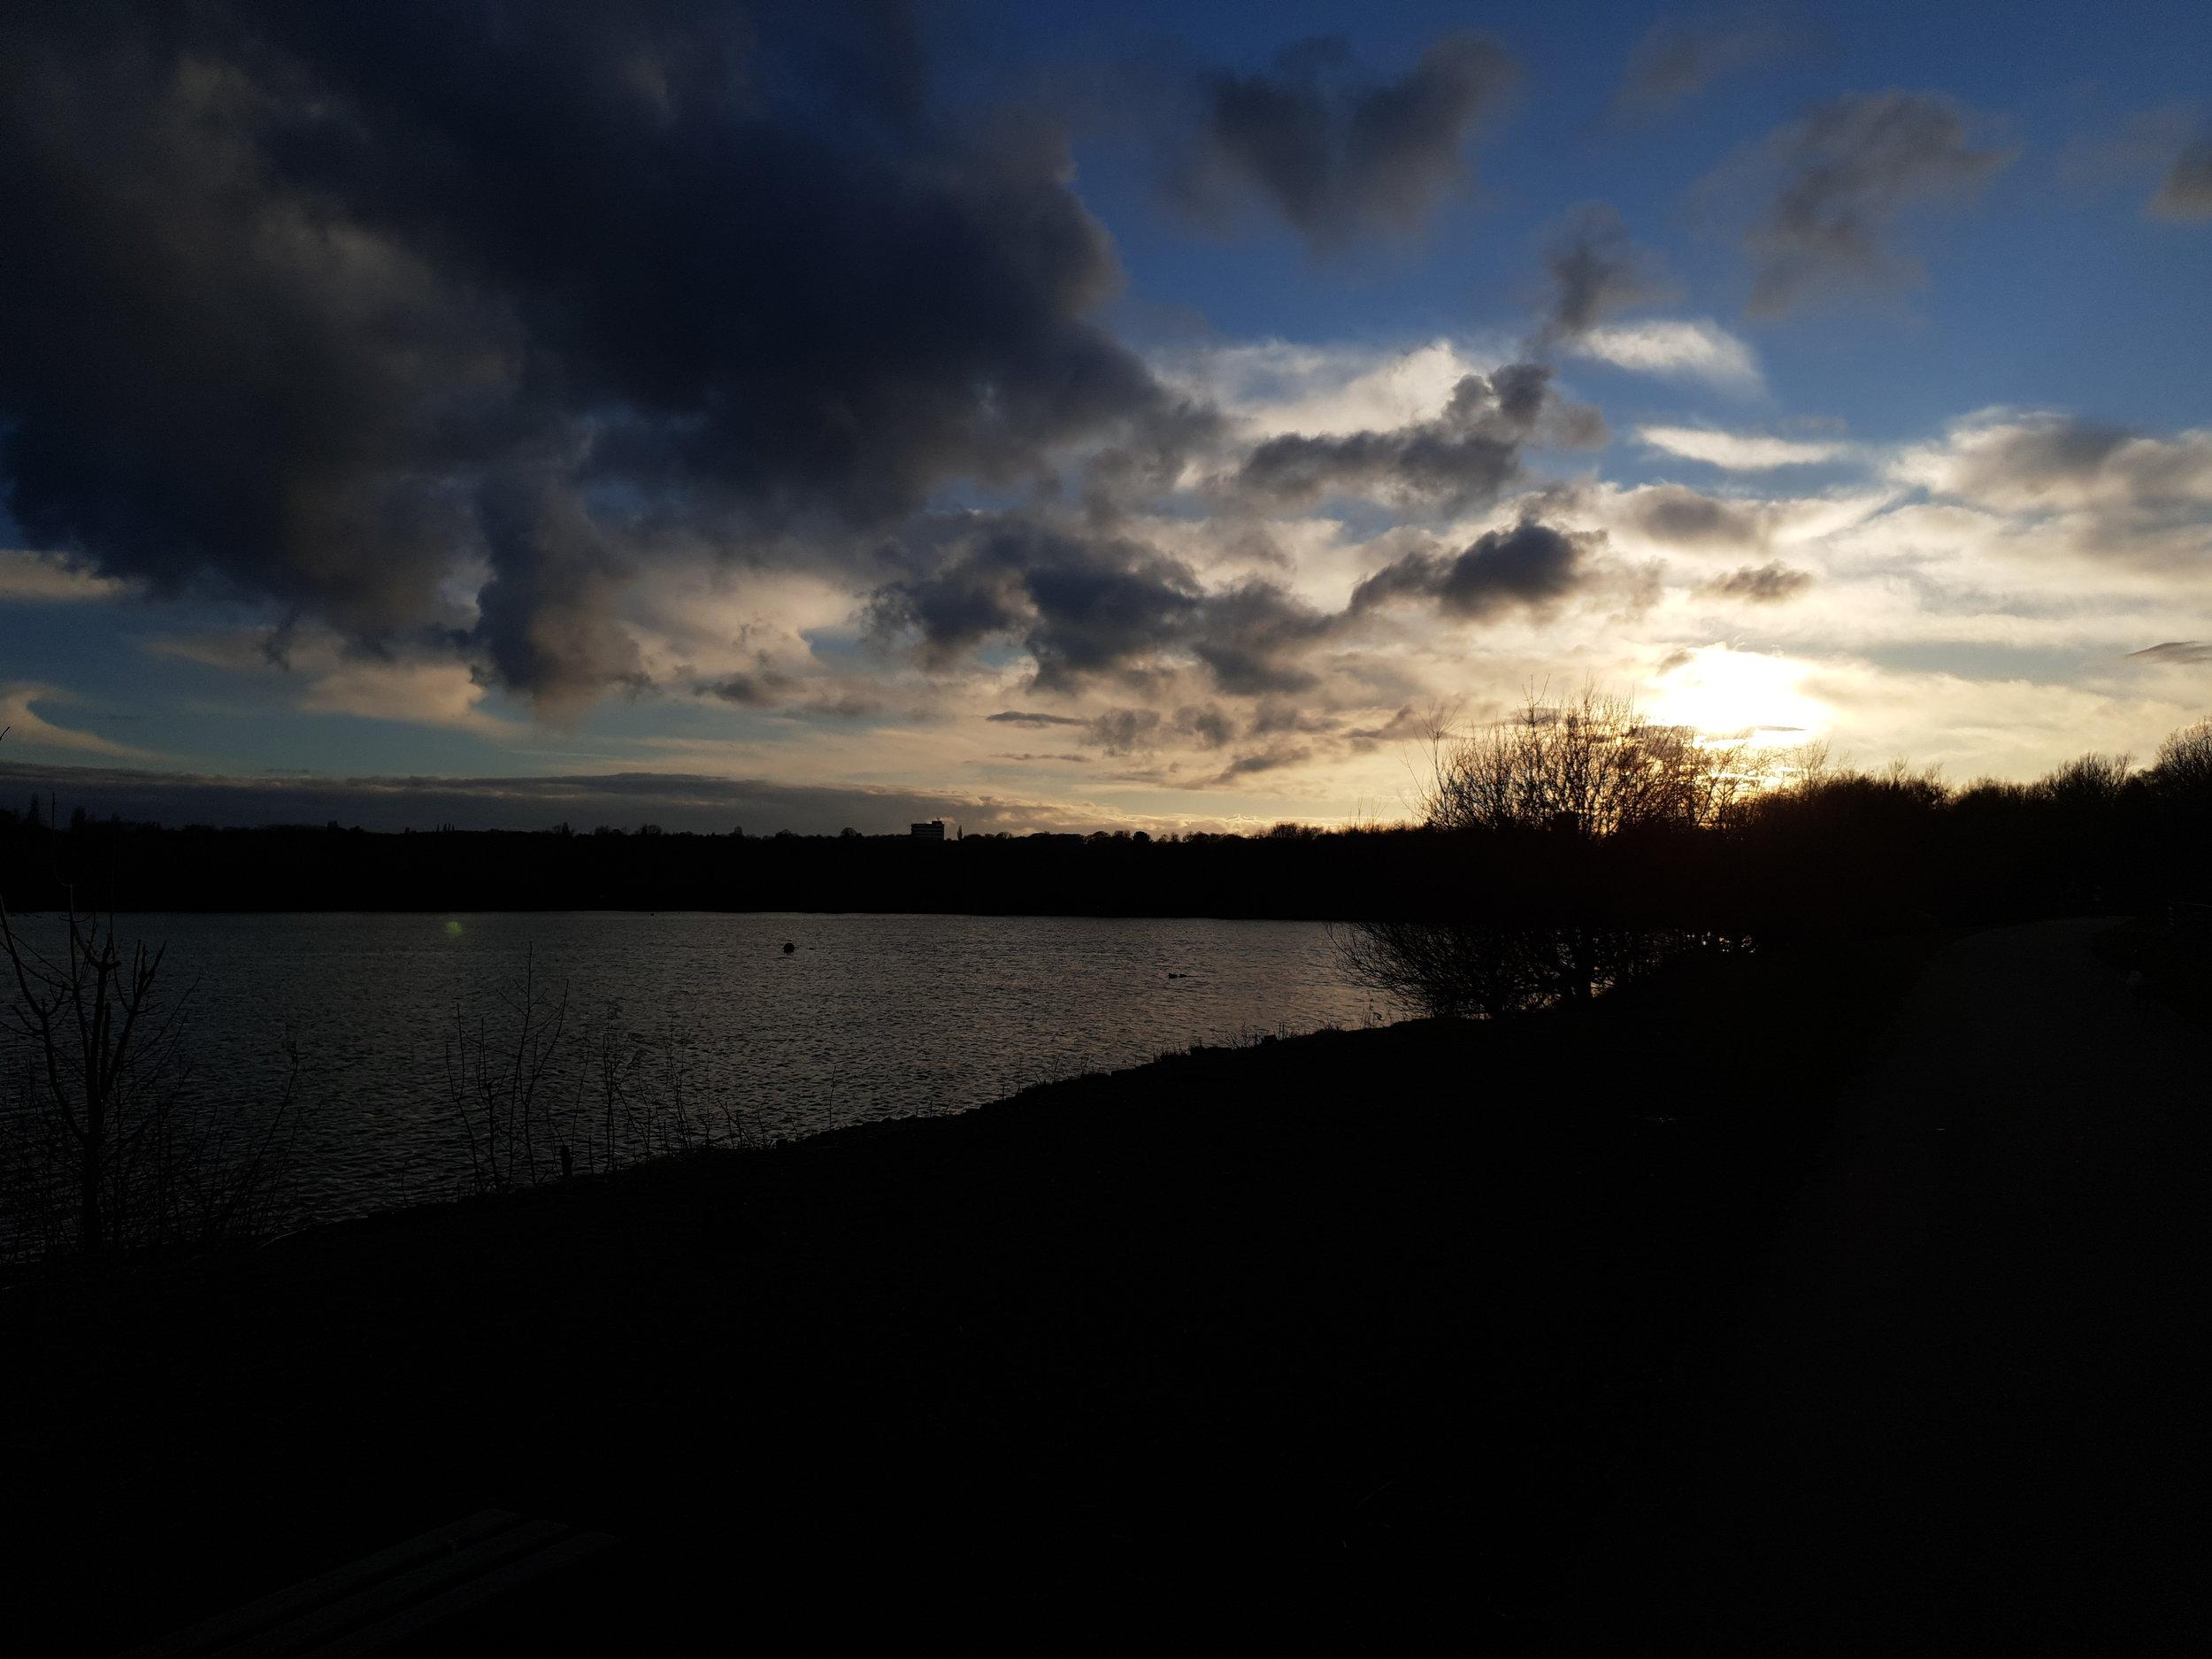 Landscape f/2.4